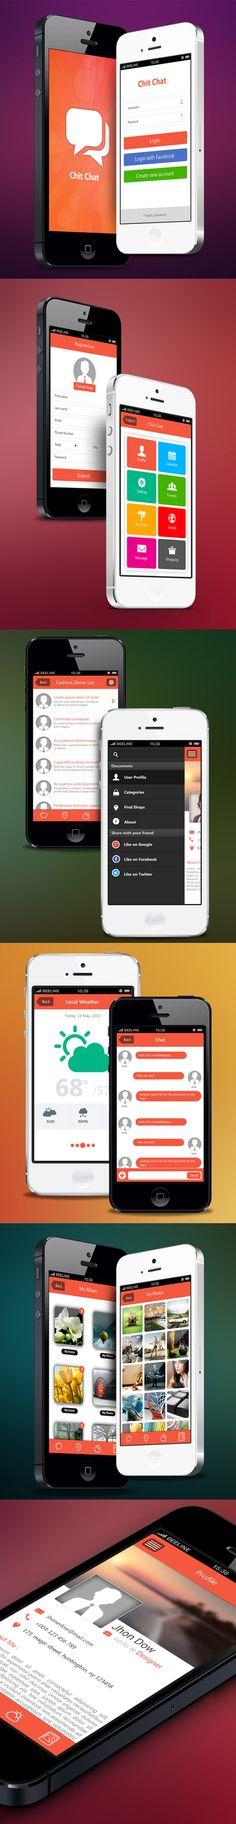 ChitChat Mobile App UI UX Design for Inspiration